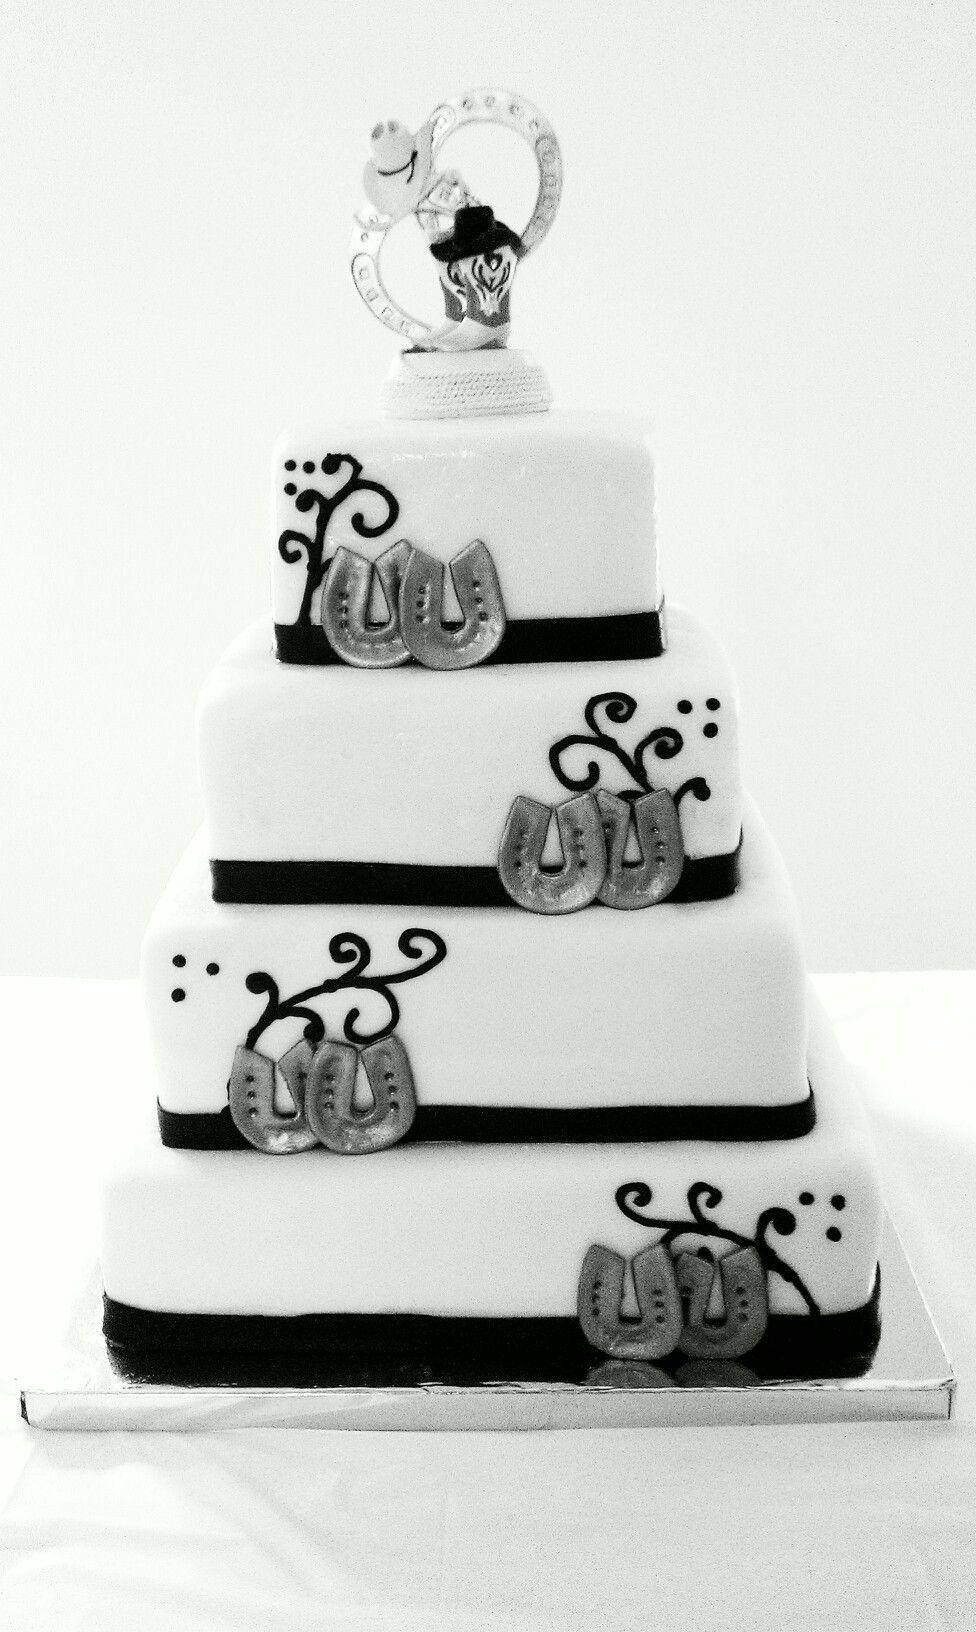 Western theme wedding cake | Cakes | Pinterest | Western theme ...